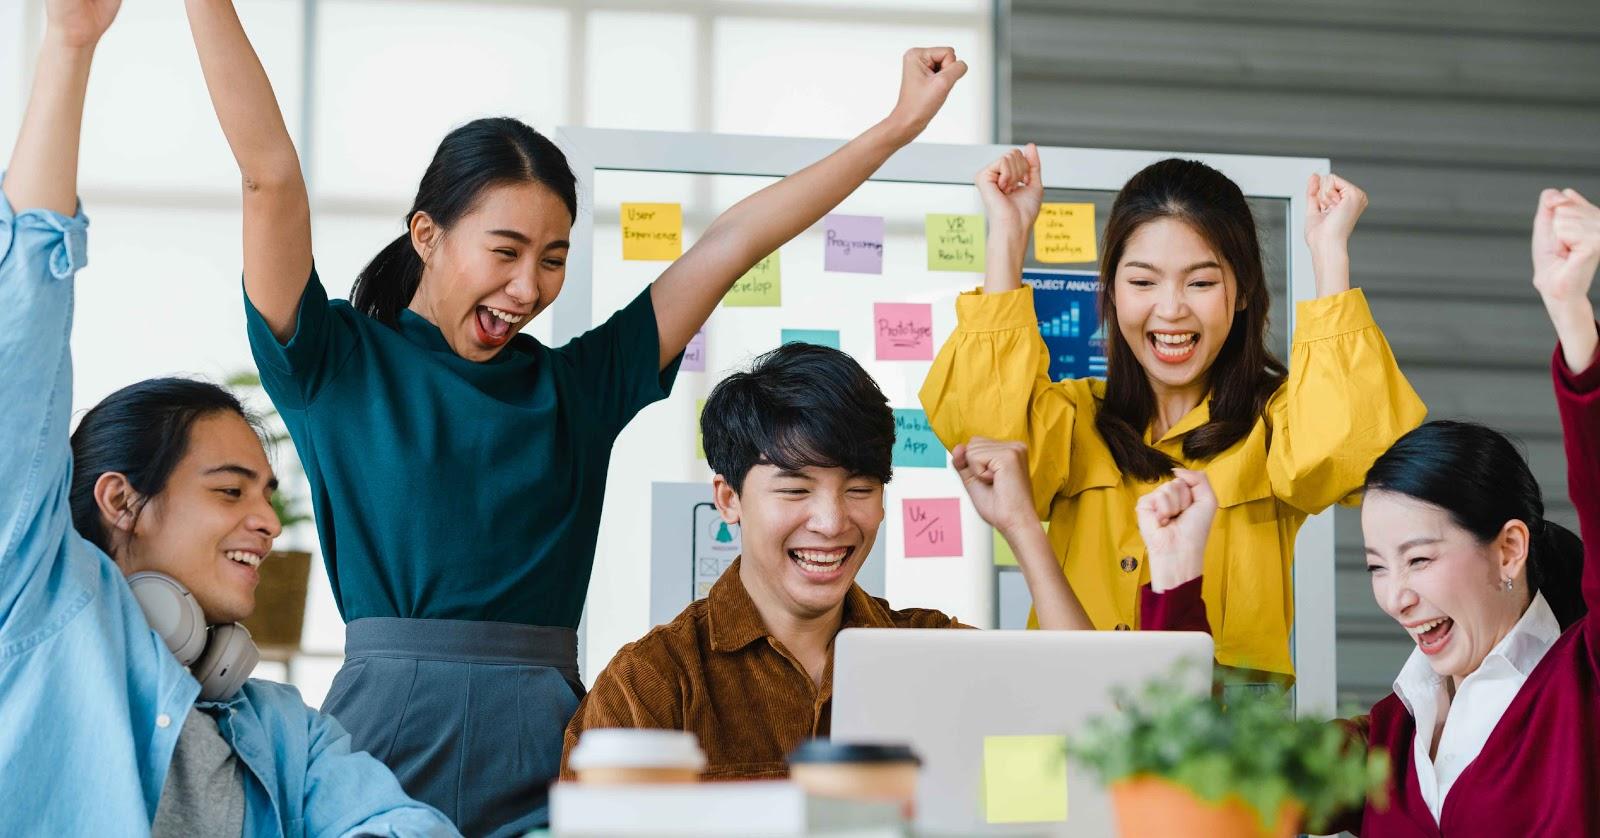 achieve the same goal to enhance team effectiveness